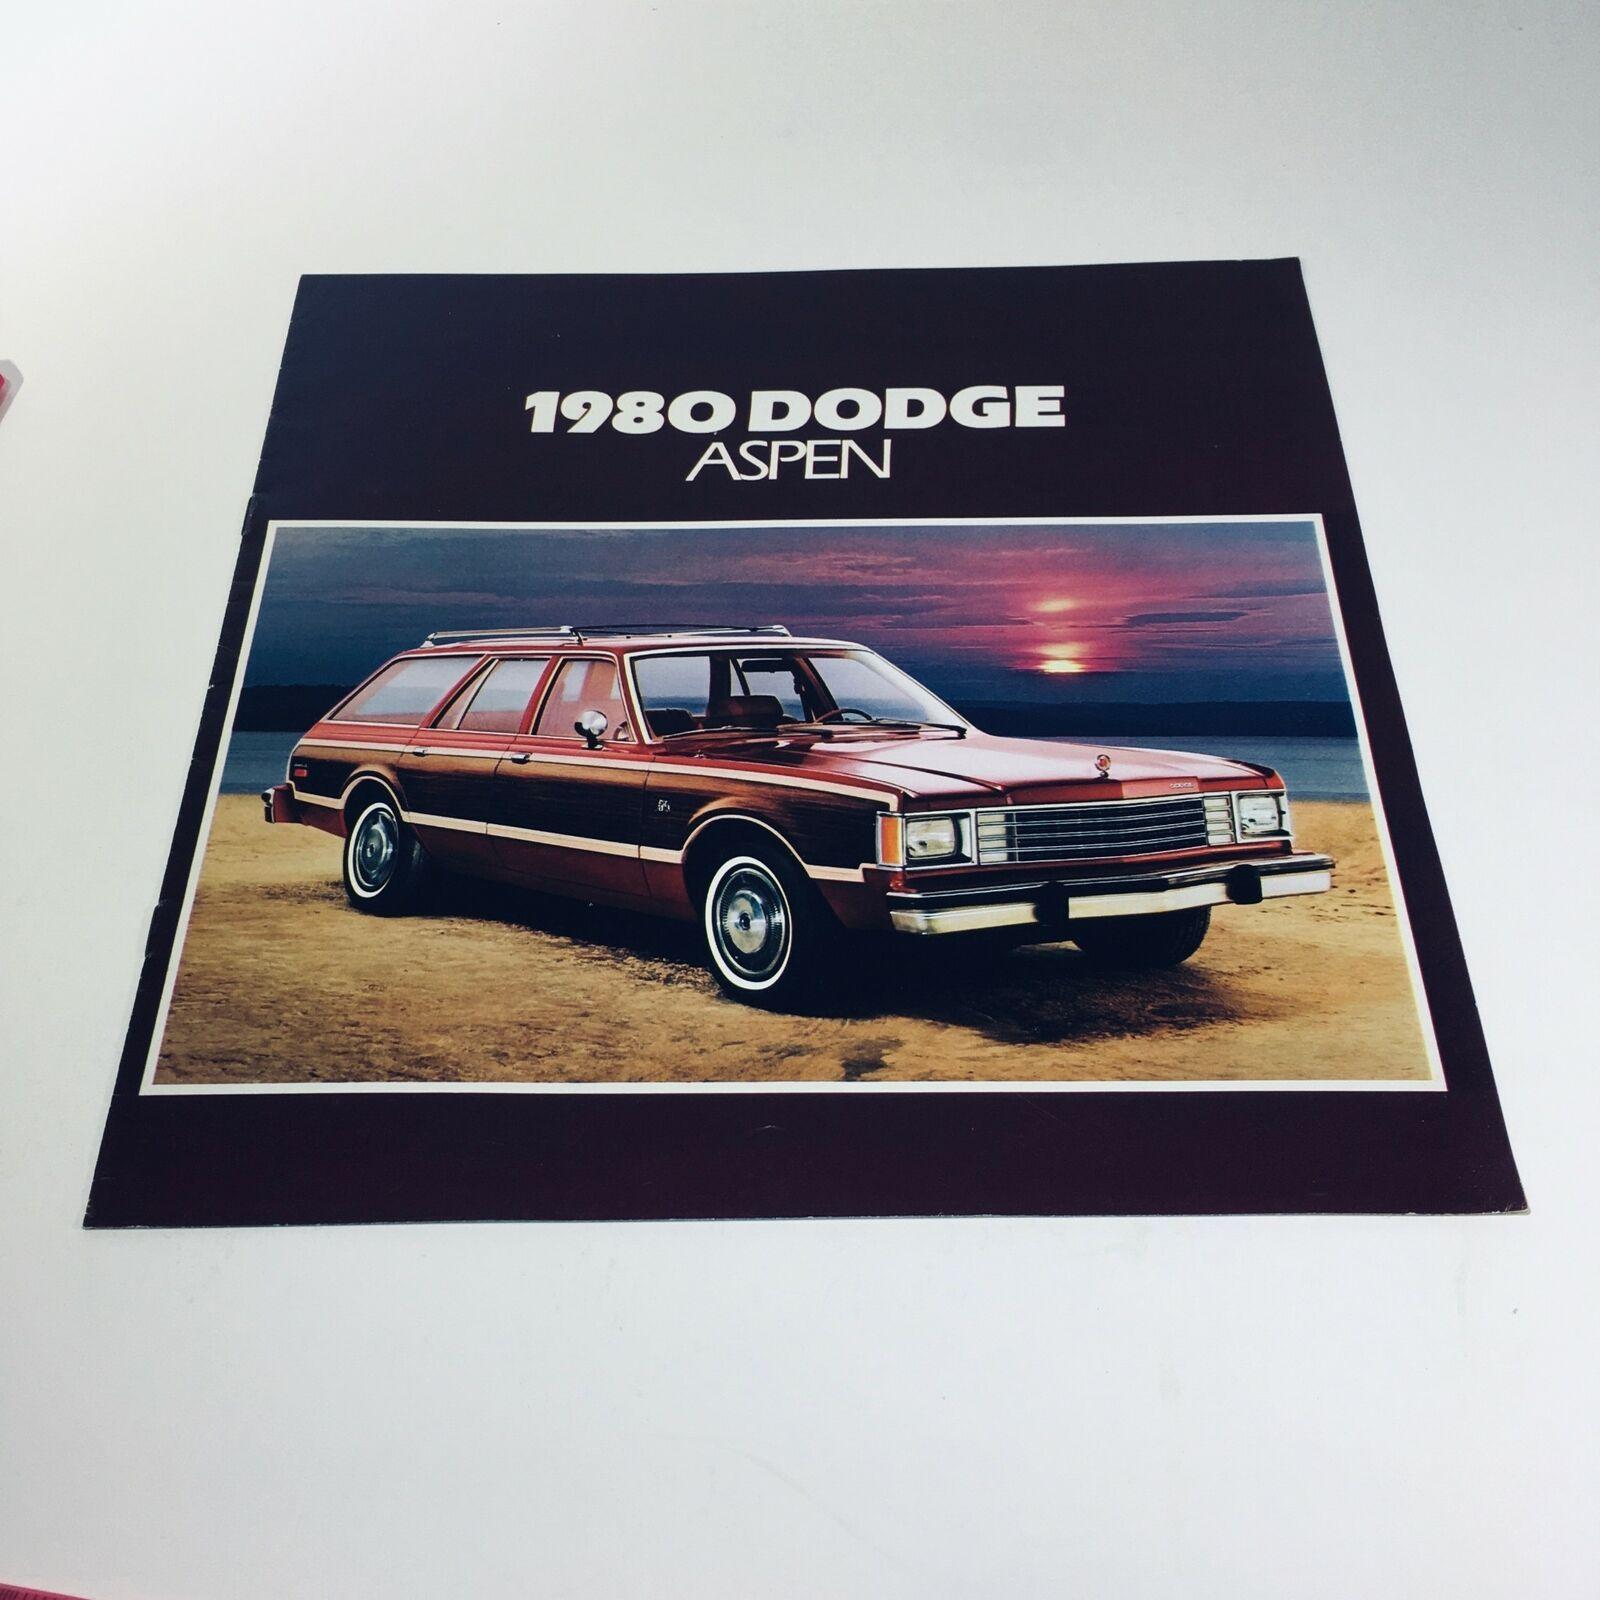 1980 Dodge Aspen Coupe Optional T-Bar Roof Compact Car Sale Brochure - $10.69